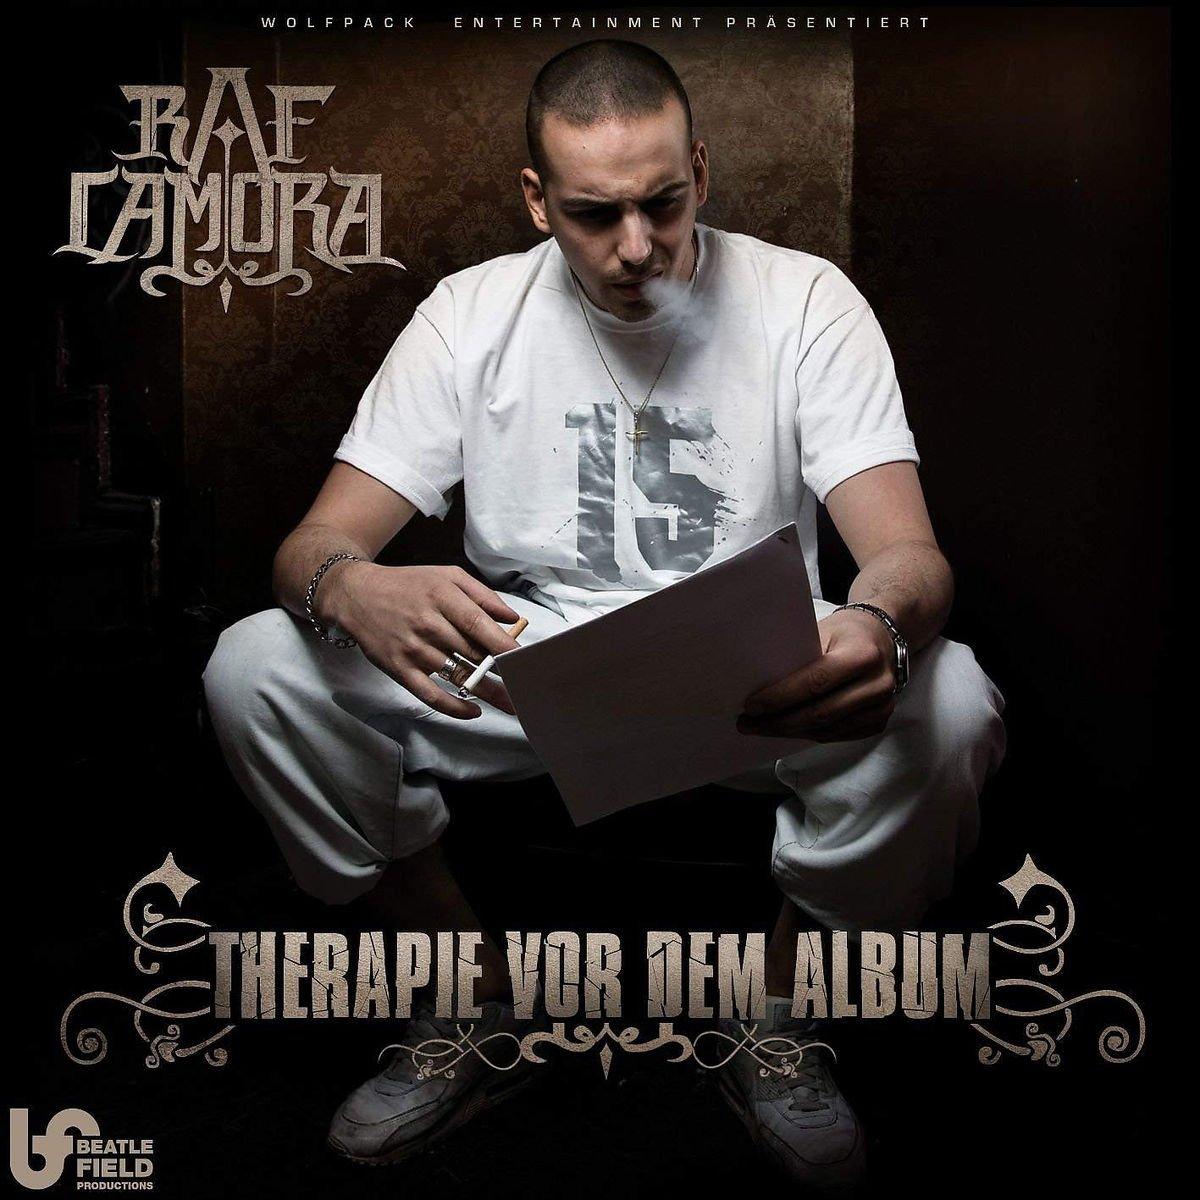 Therapie Vor dem Album   Raf Camora Amazon.de Musik